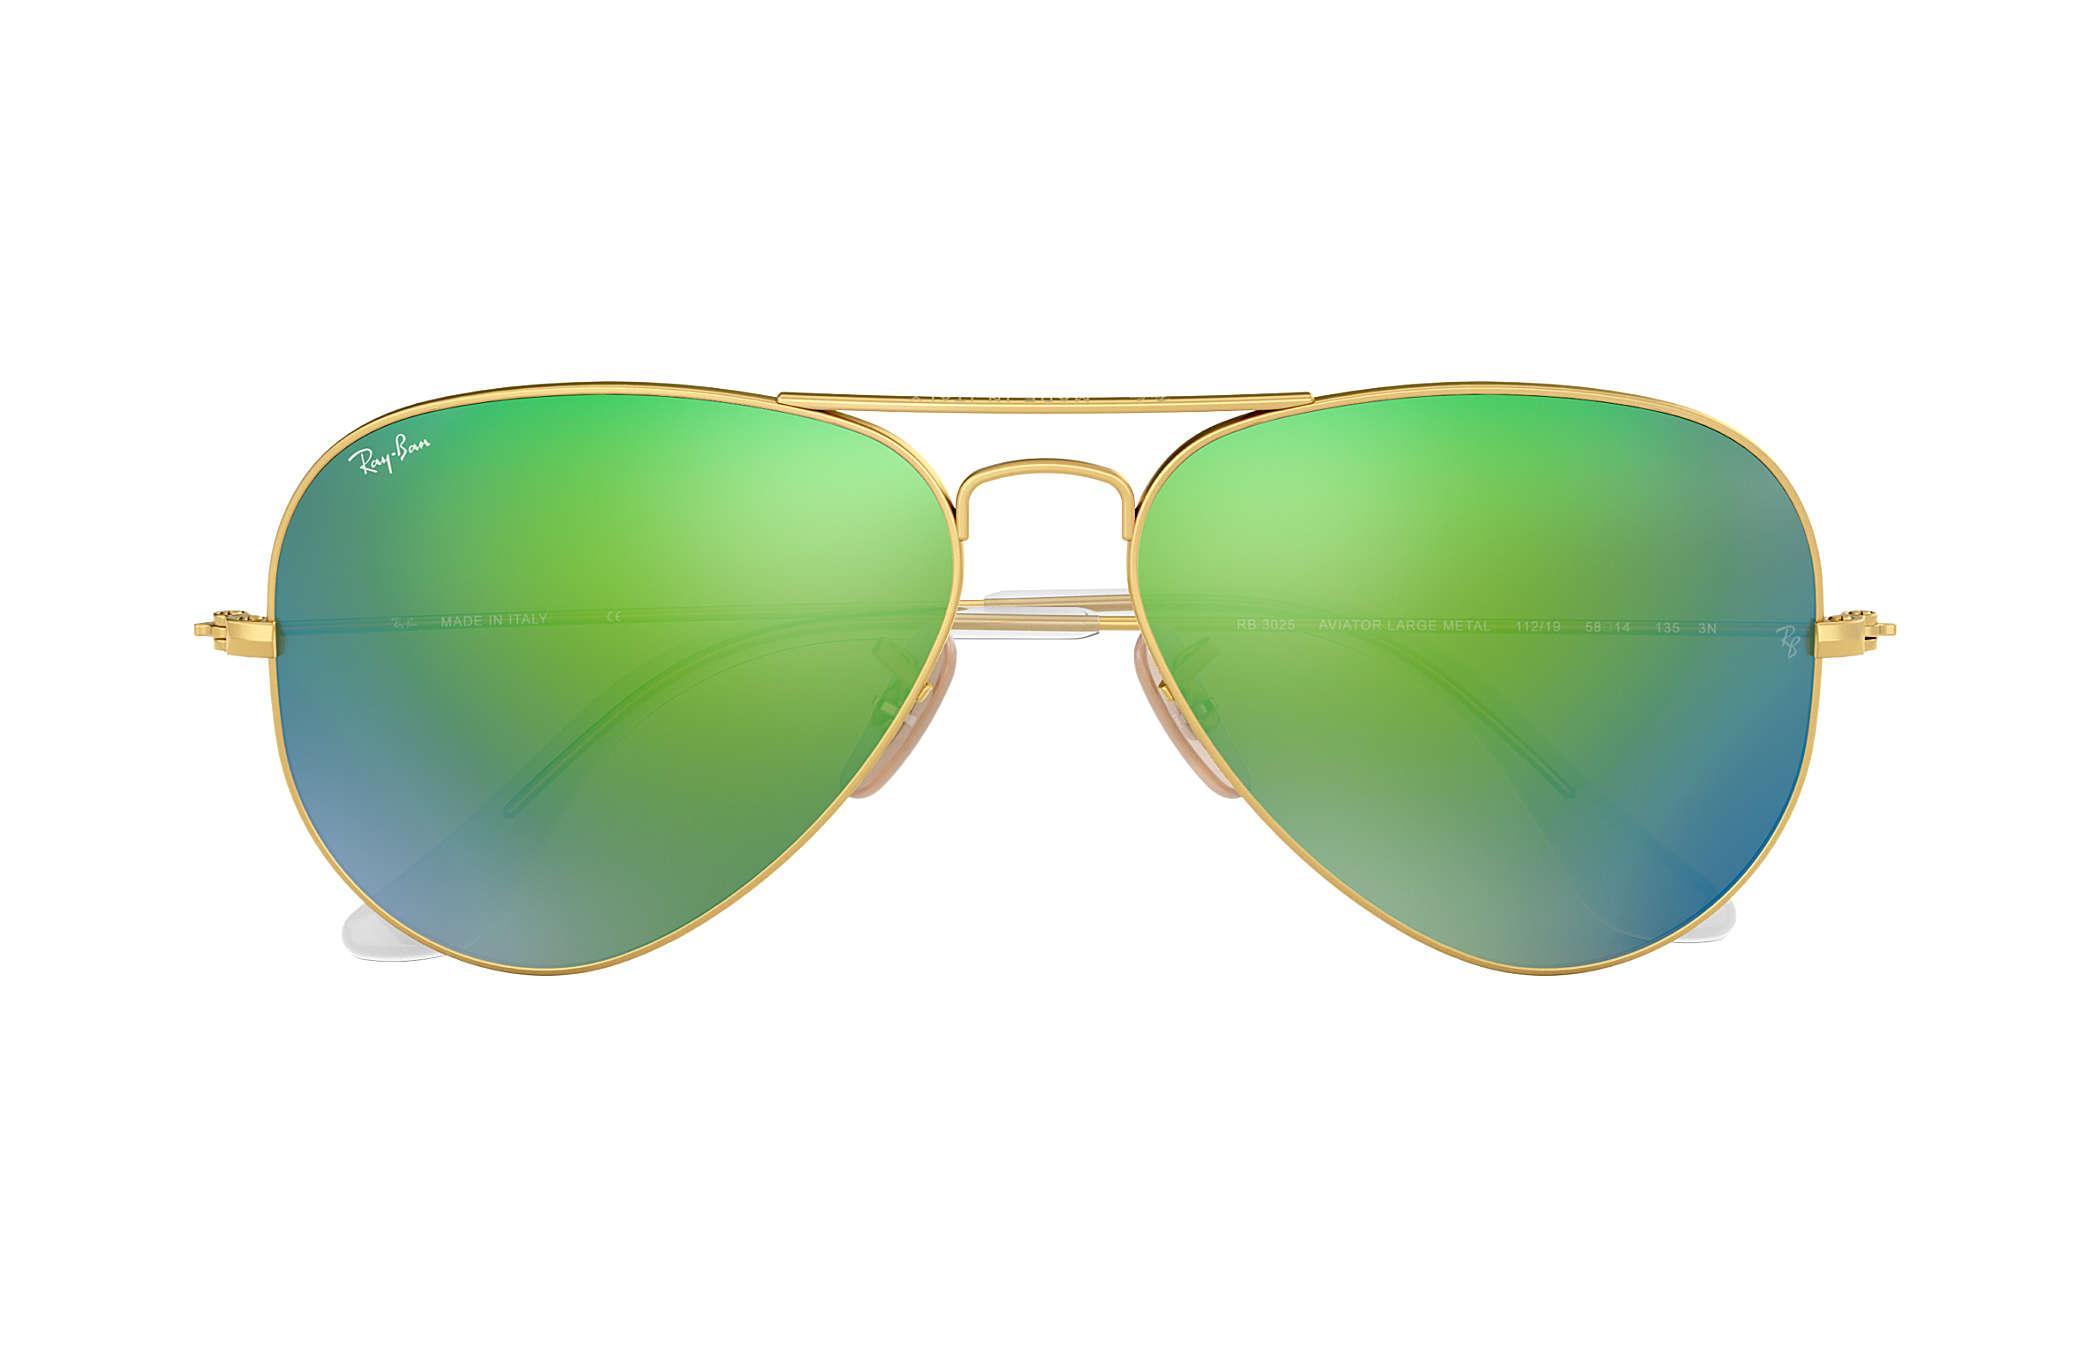 9cf4b5ece4b ... sunglasses 3049d 97094  canada ray ban 0rb3025 aviator flash lenses  gold sun e1fe0 8aaba